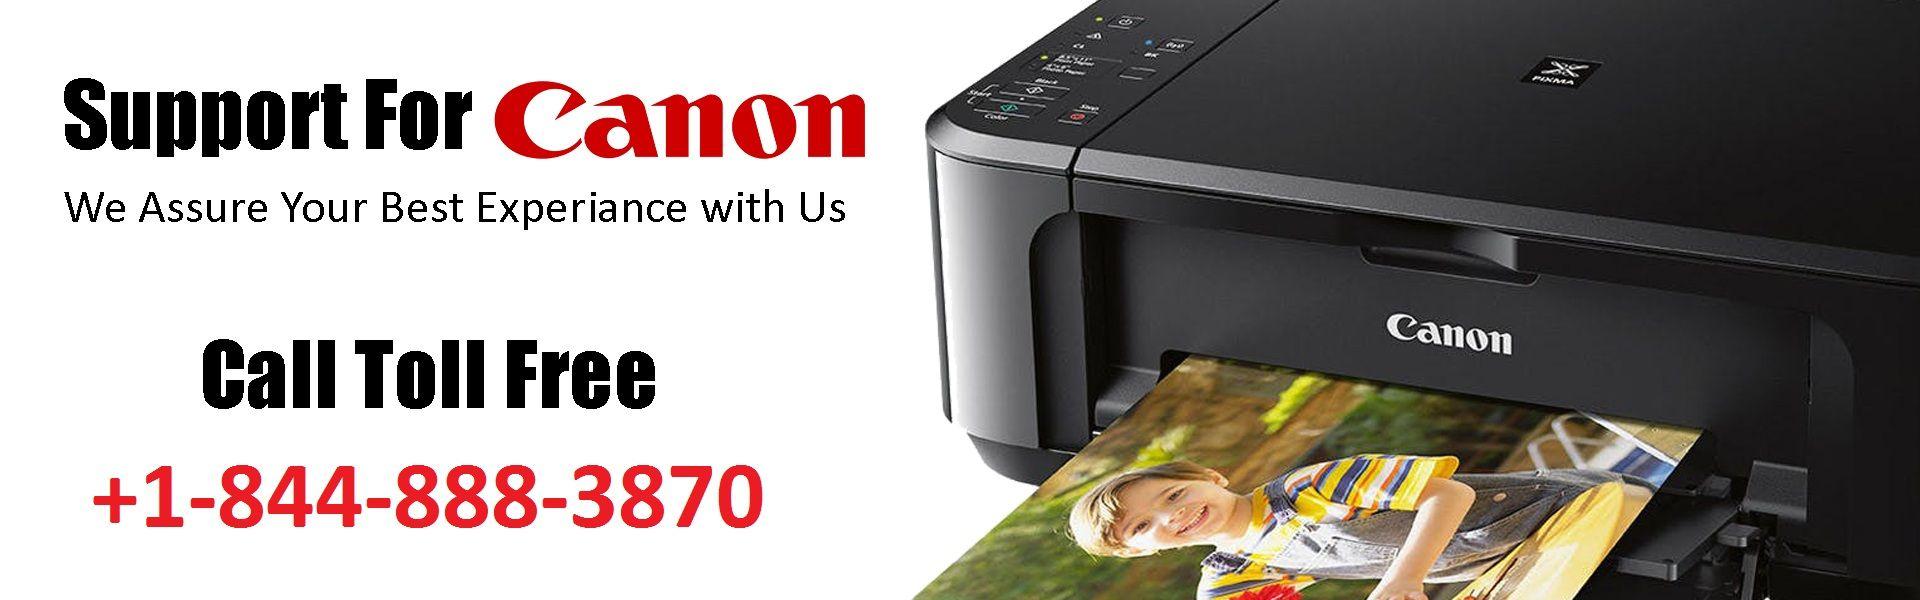 Canon Printer Helpline Number Canada 18448883870